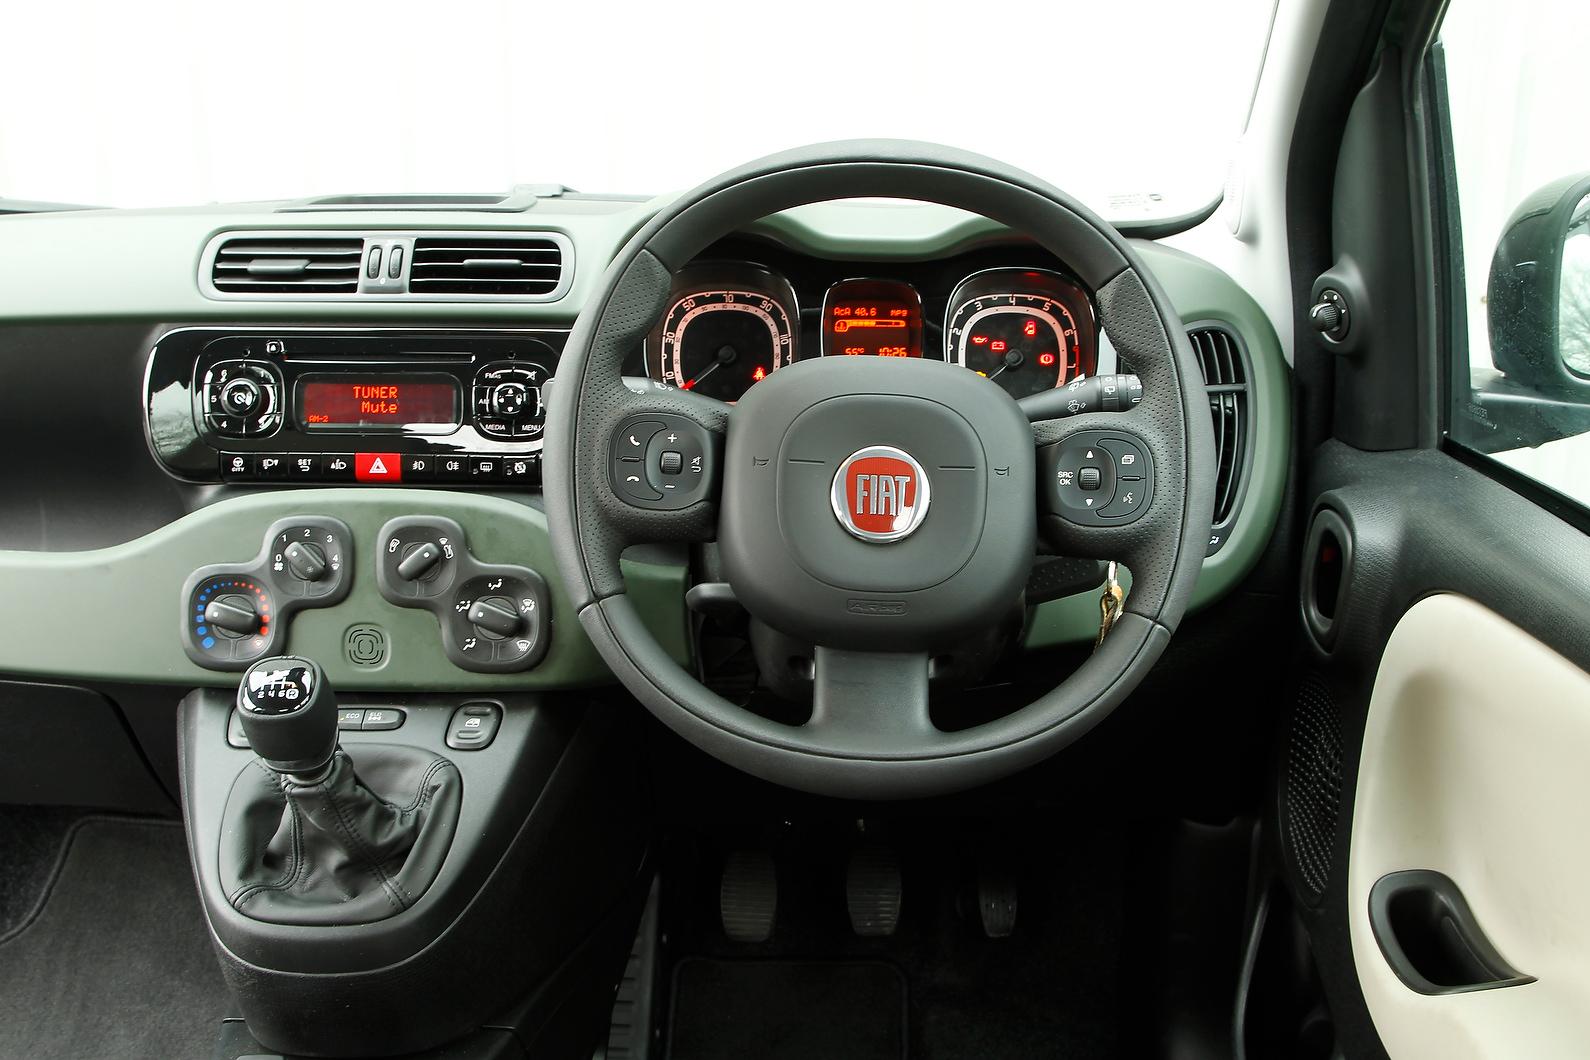 Fiat Panda 4x4 Interior Autocar